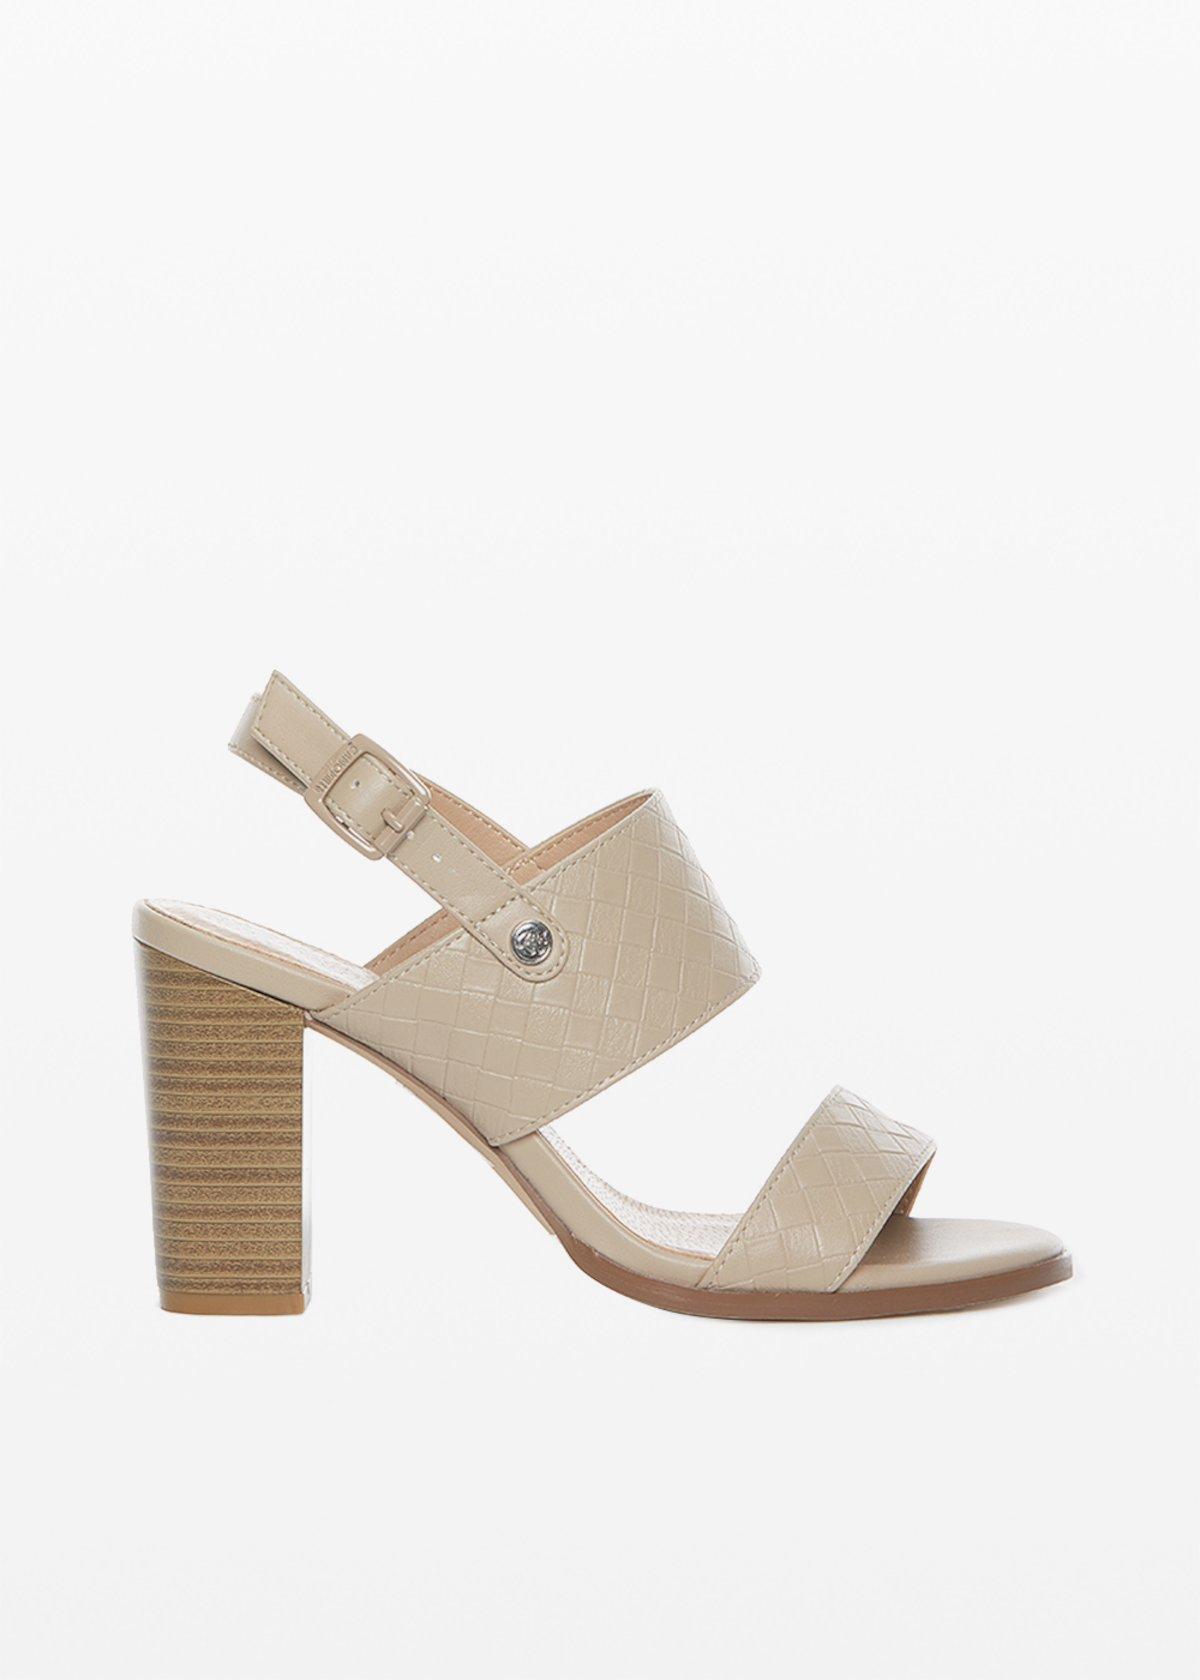 Sadik faux leather sandals - Doeskin - Woman